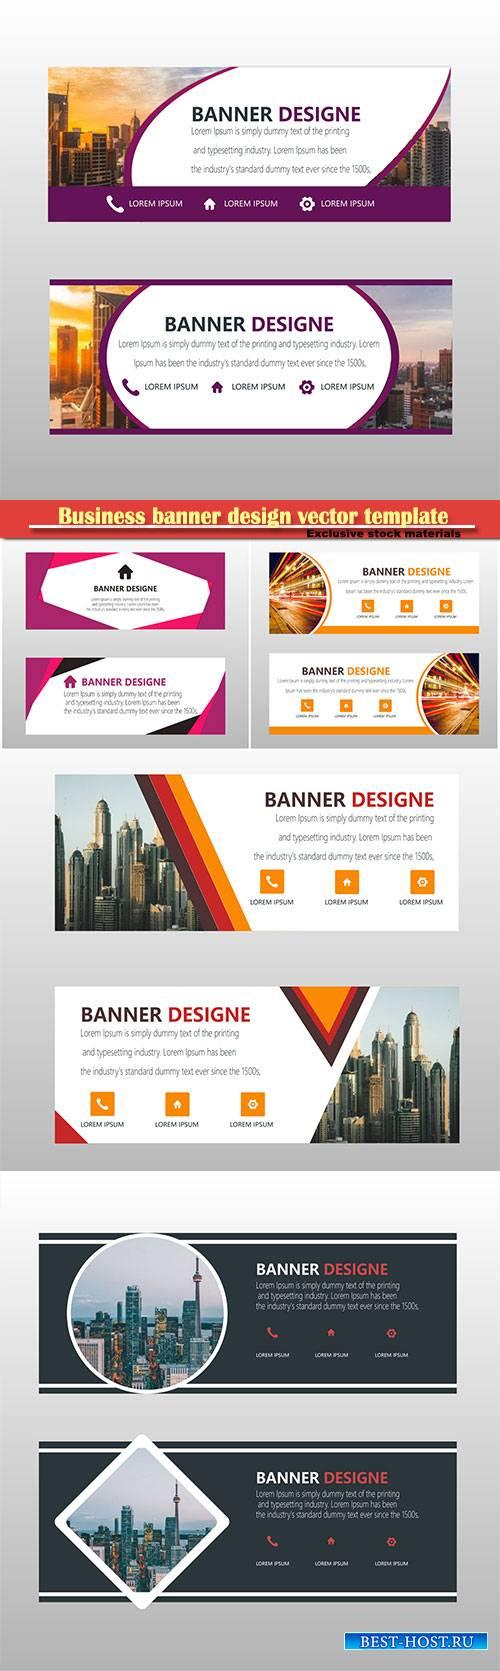 Business banner design vector template